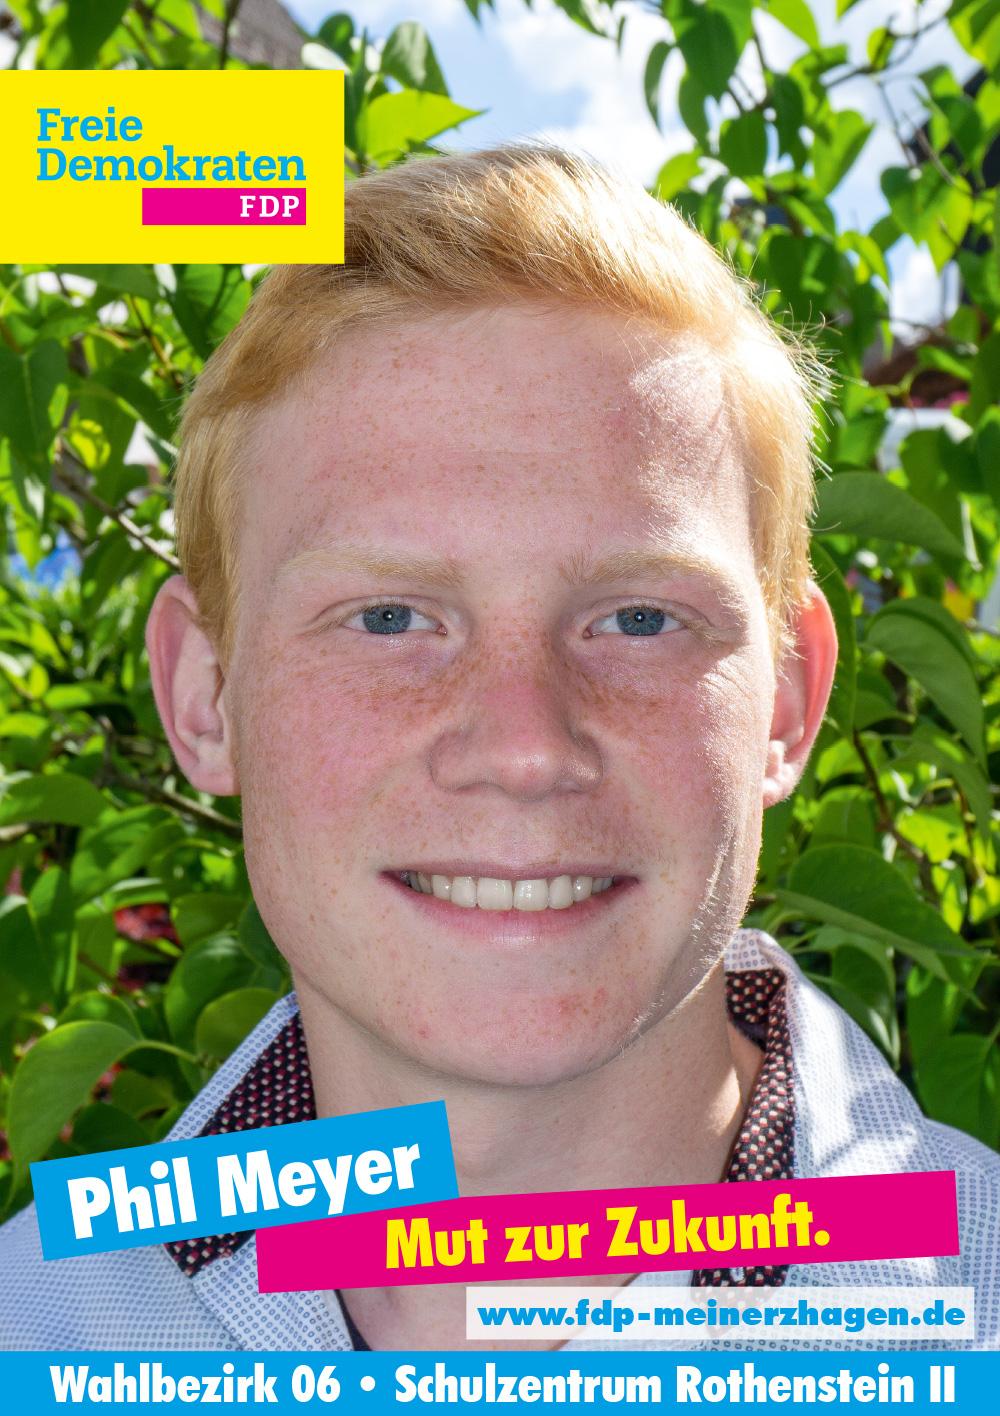 Wahlbezirk 6 - Phil Meyer